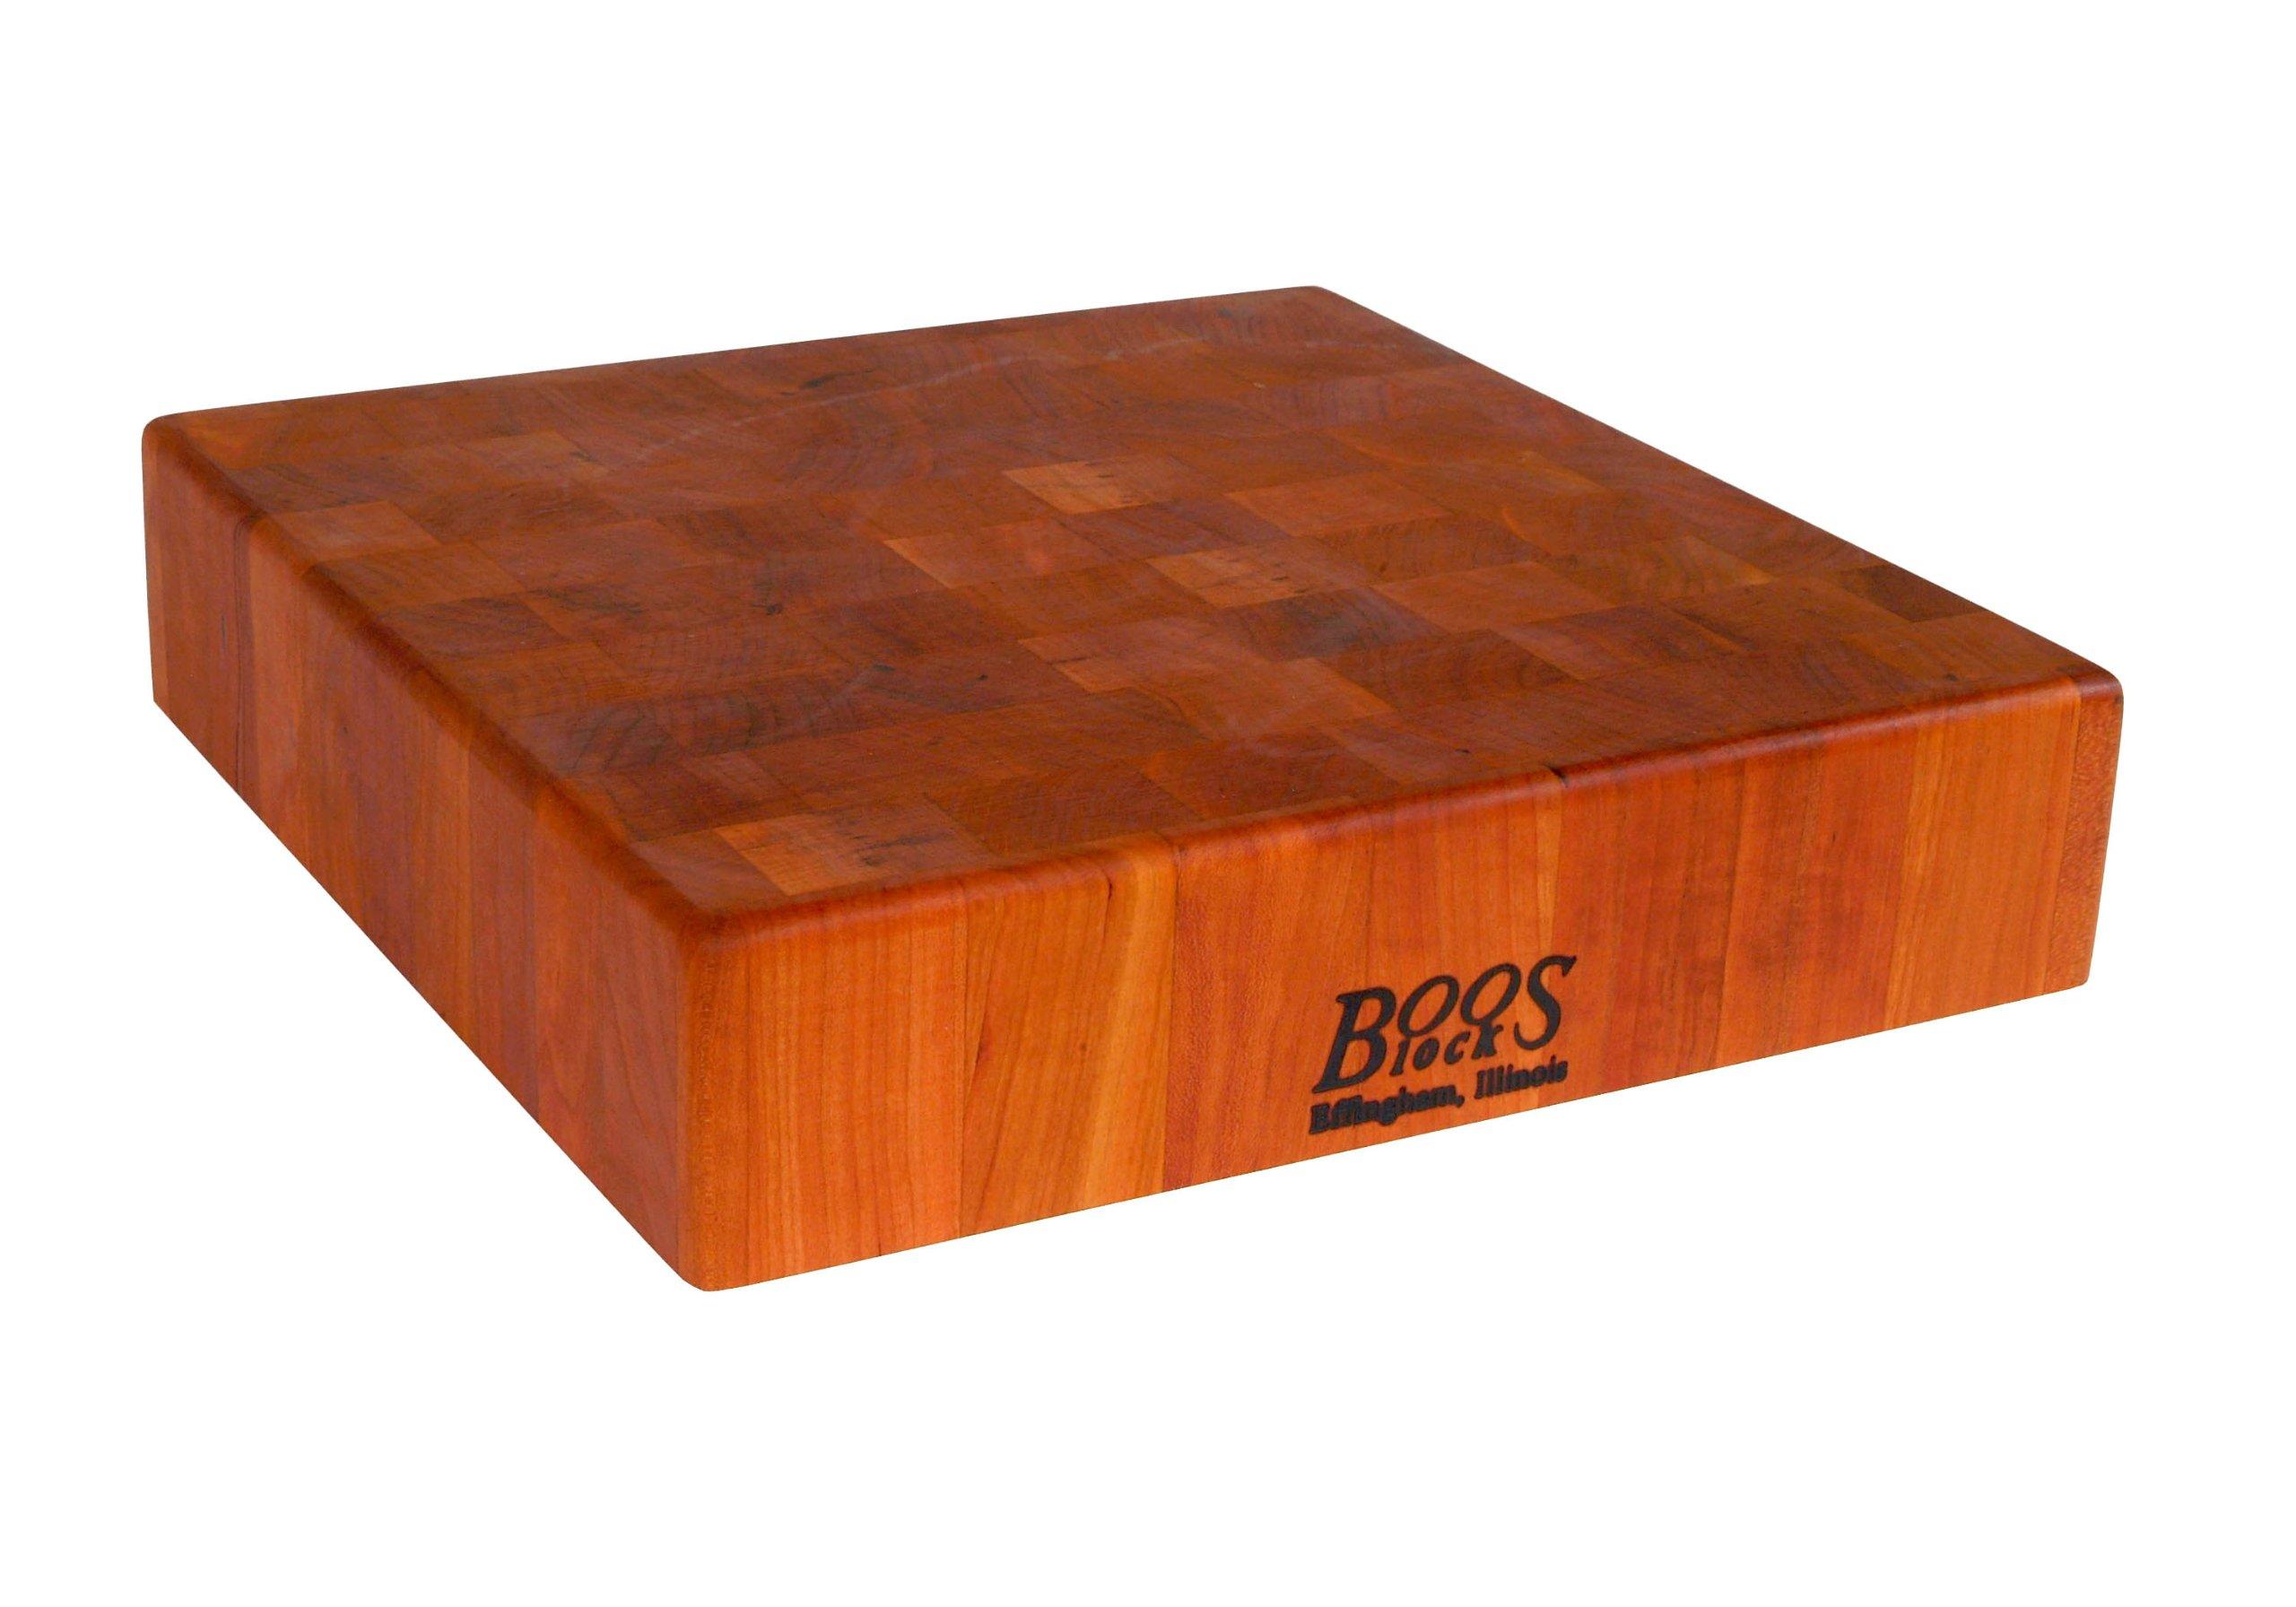 john-boos-cherry-wood-end grain-butcher-block-best-wood-cutting-boards-reviews